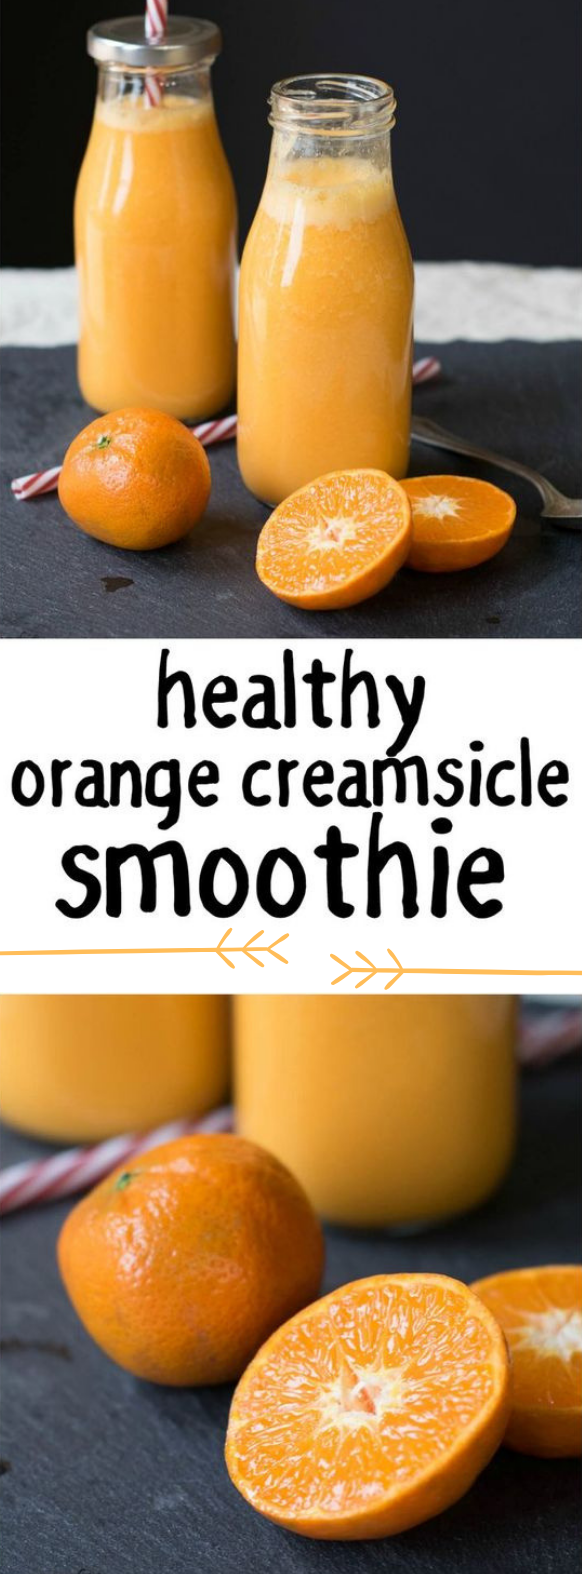 Healthy Orange Creamsicle Smoothie  #Smoothie #drink